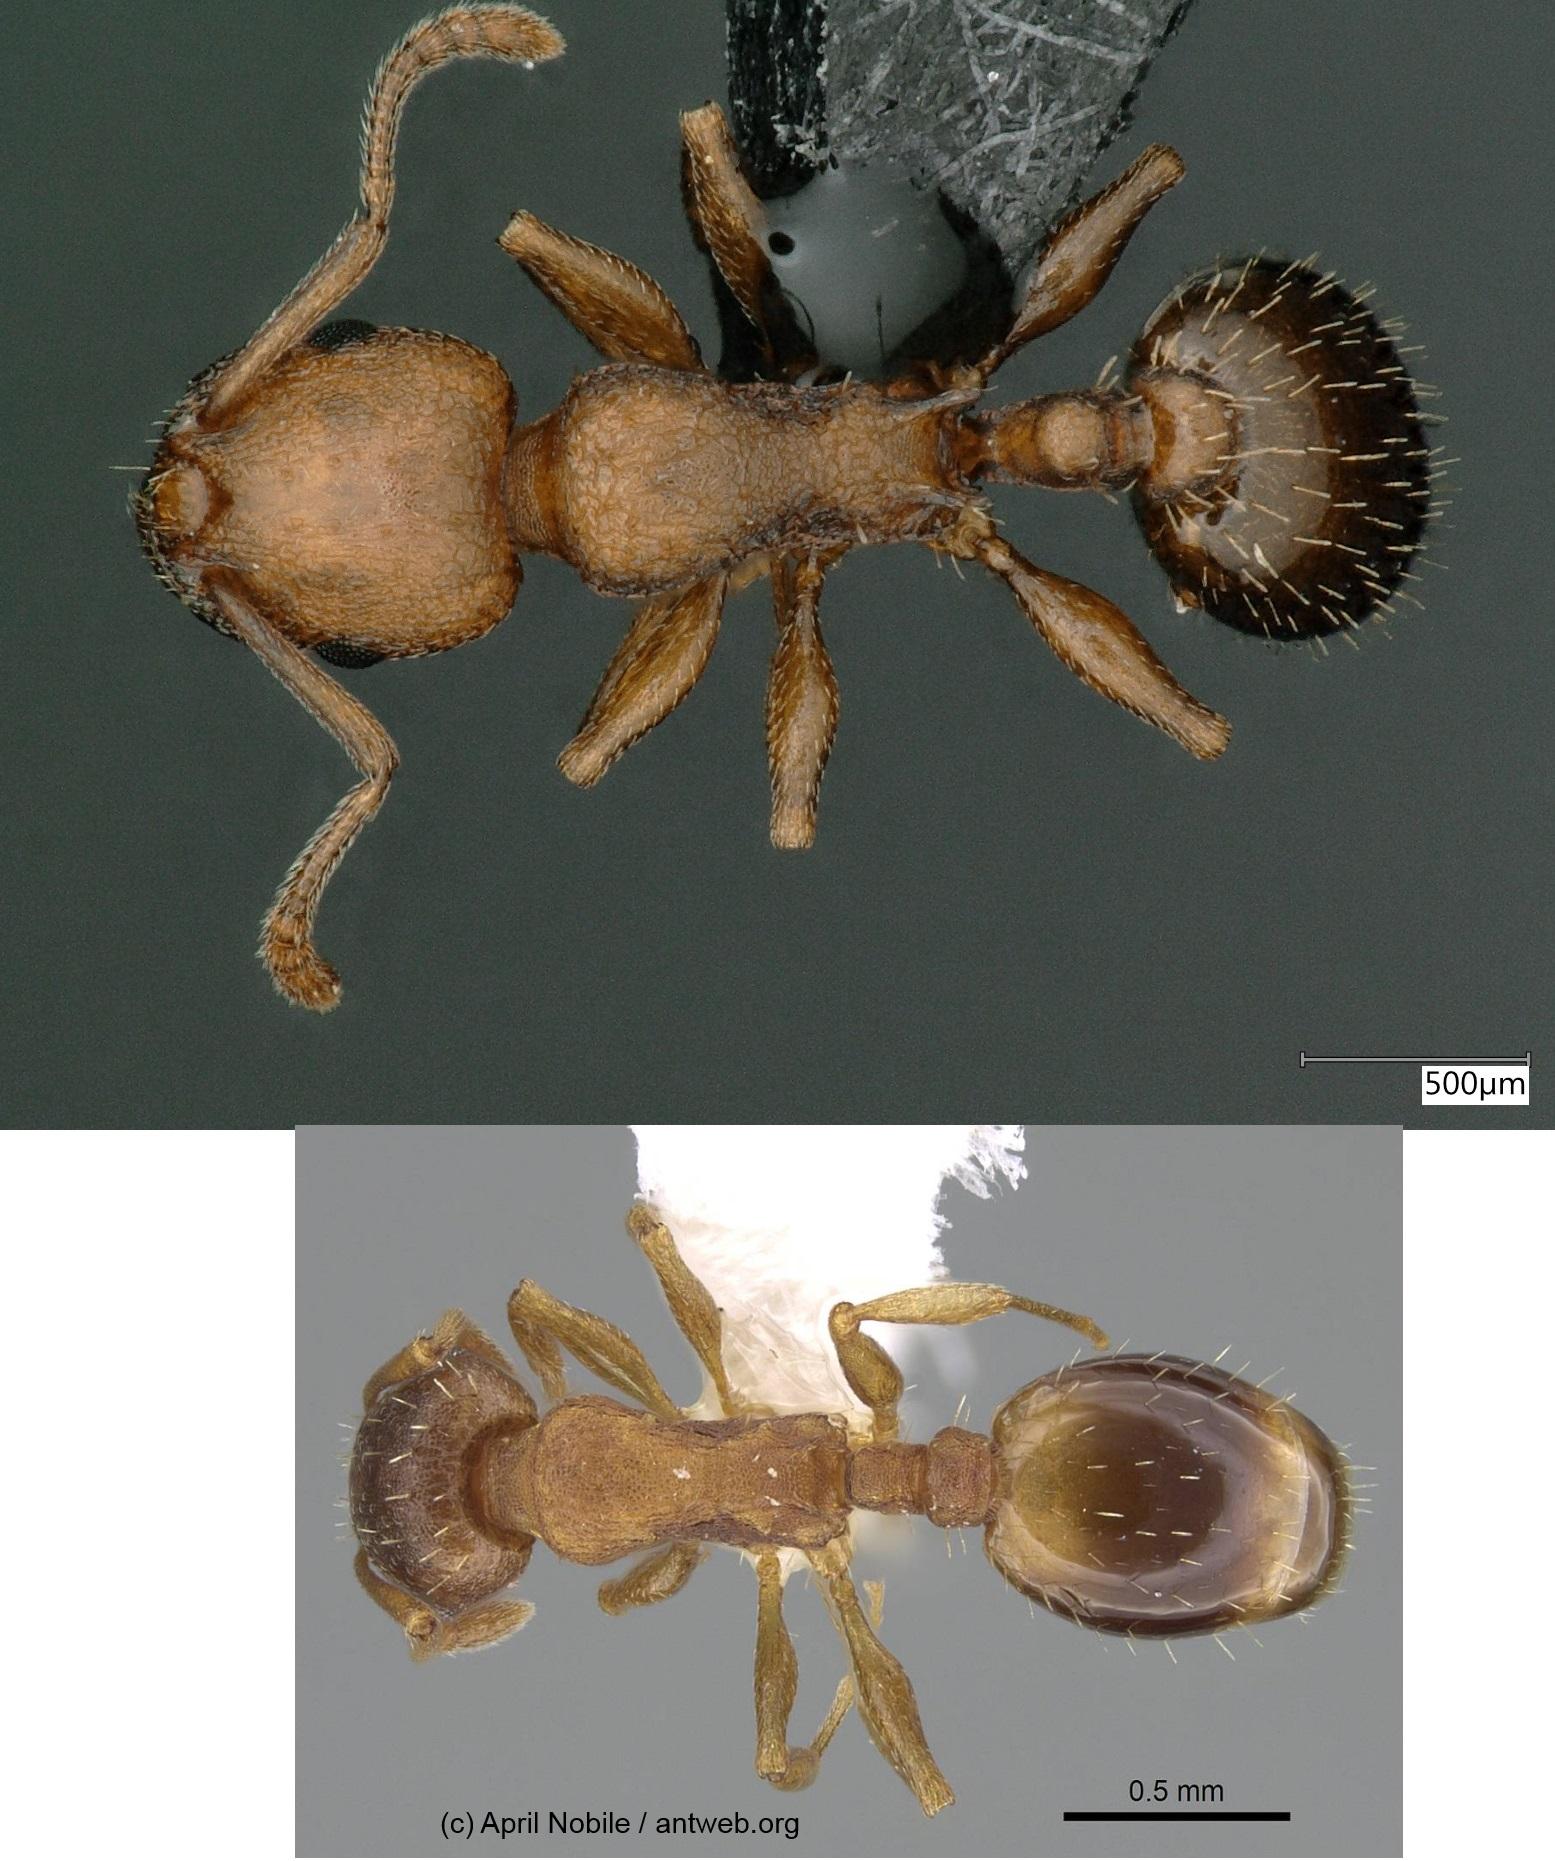 vergleich clypeatus_nylanderi_dorsal